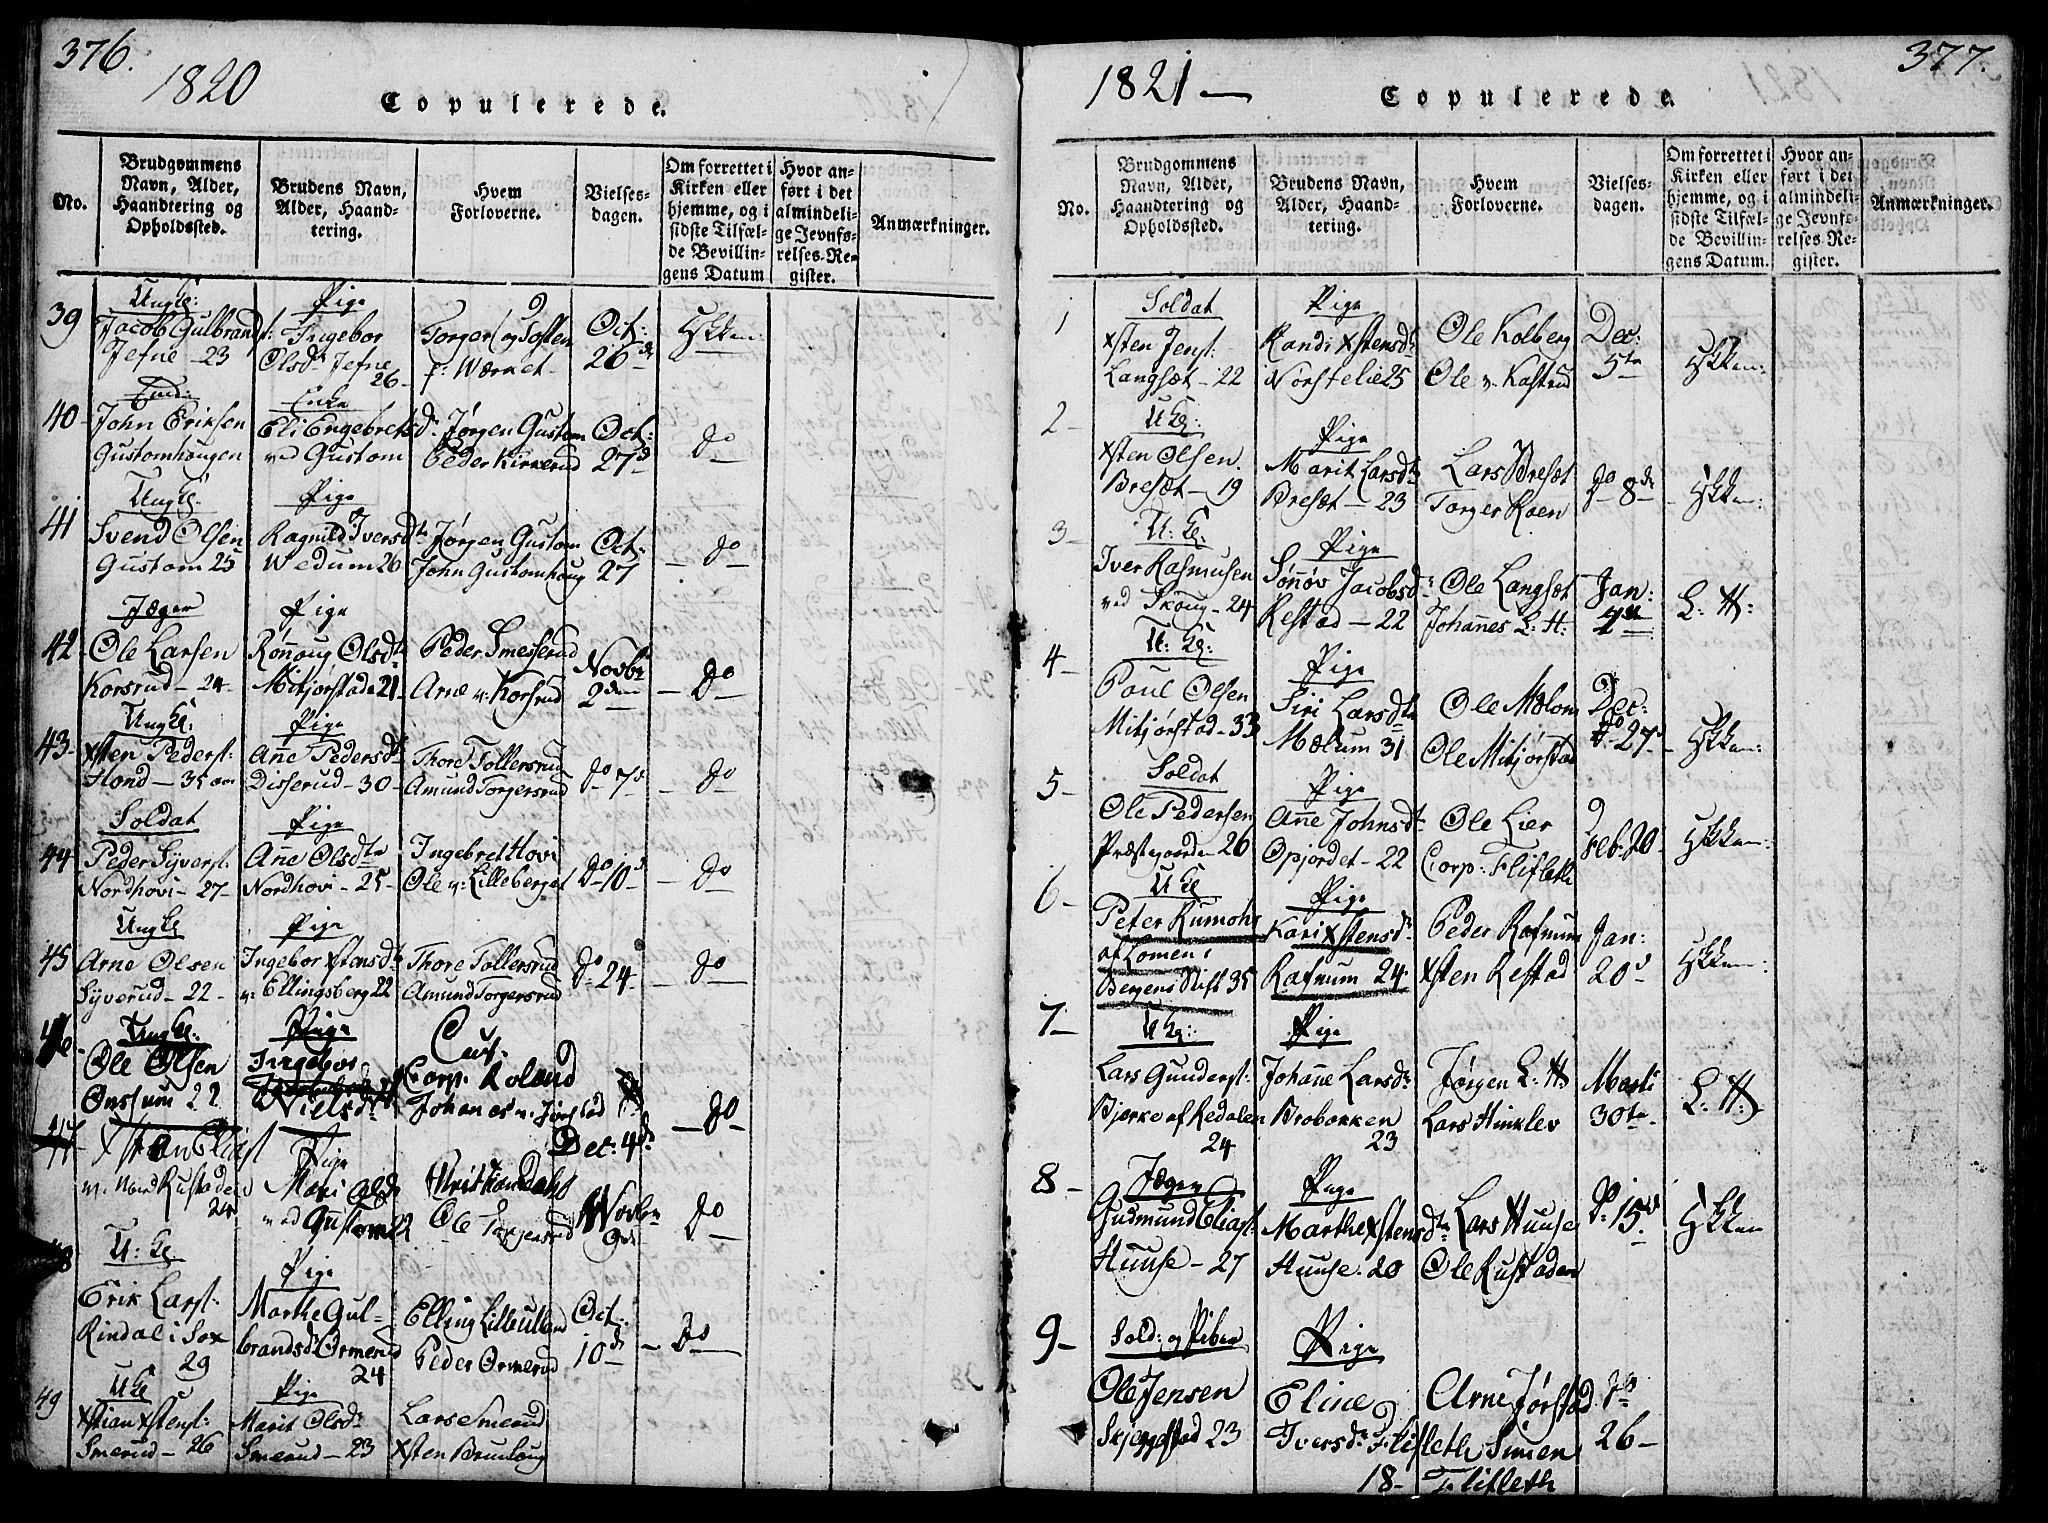 SAH, Fåberg prestekontor, Klokkerbok nr. 4, 1818-1837, s. 376-377